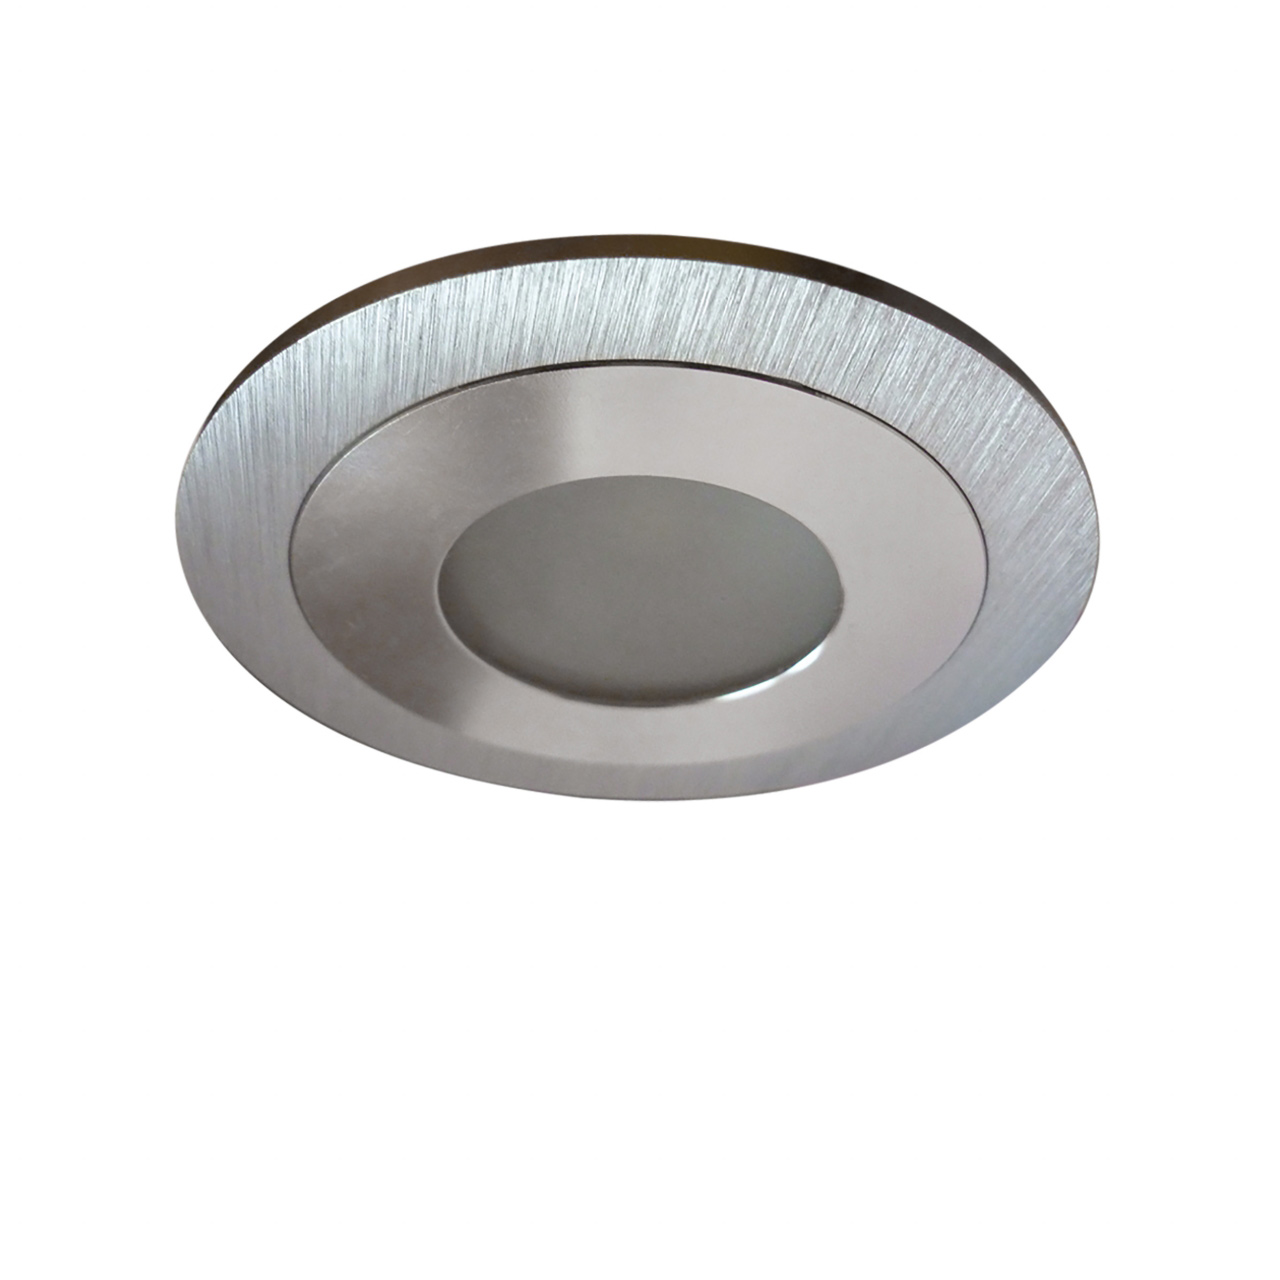 Светильник Leddy cyl LED 3W 240LM алюминий 4000K в стену в подрозетник с трансф Lightstar 212171